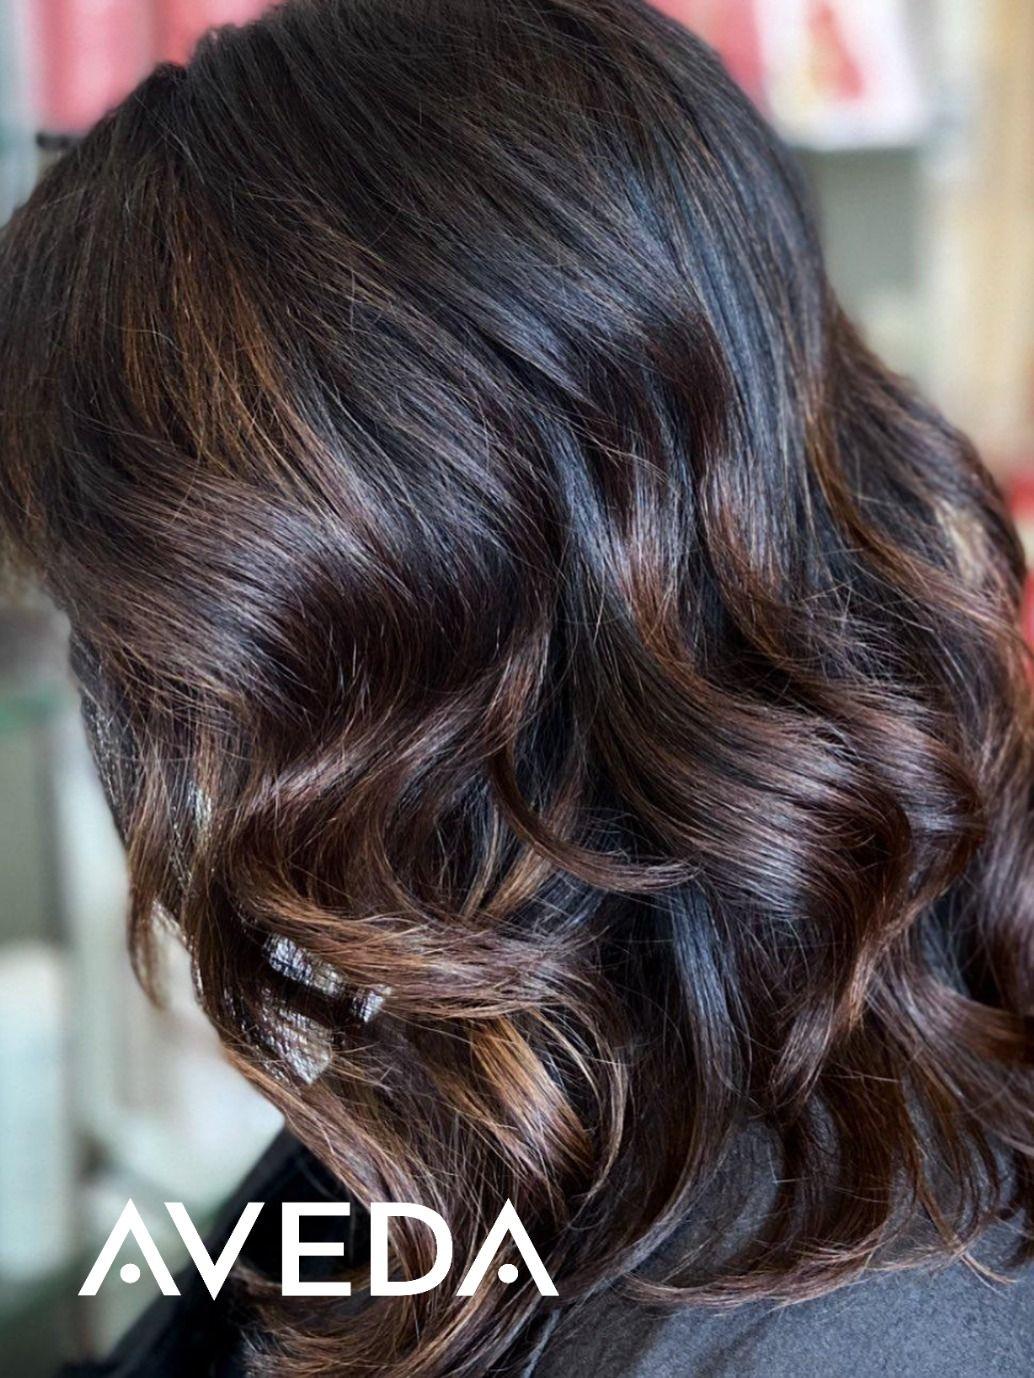 Hair Color Landing Page In 2020 Mocha Color Hair Aveda Hair Color Mocha Hair